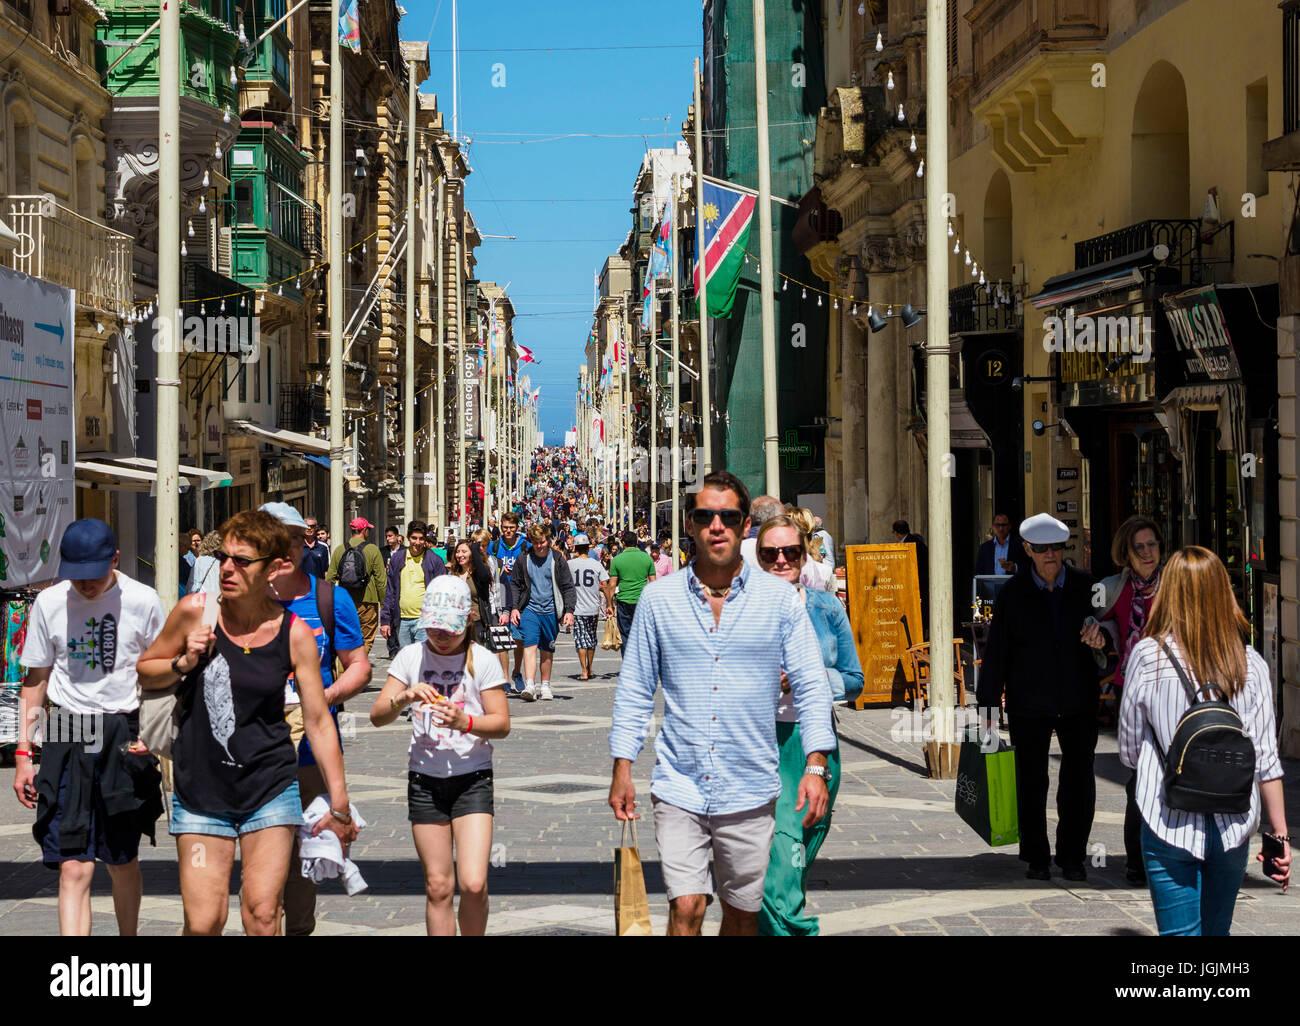 Los peatones caminar a lo largo de Republic Street / Triq Ir-Repubblika / en Valletta, Malta. Imagen De Stock